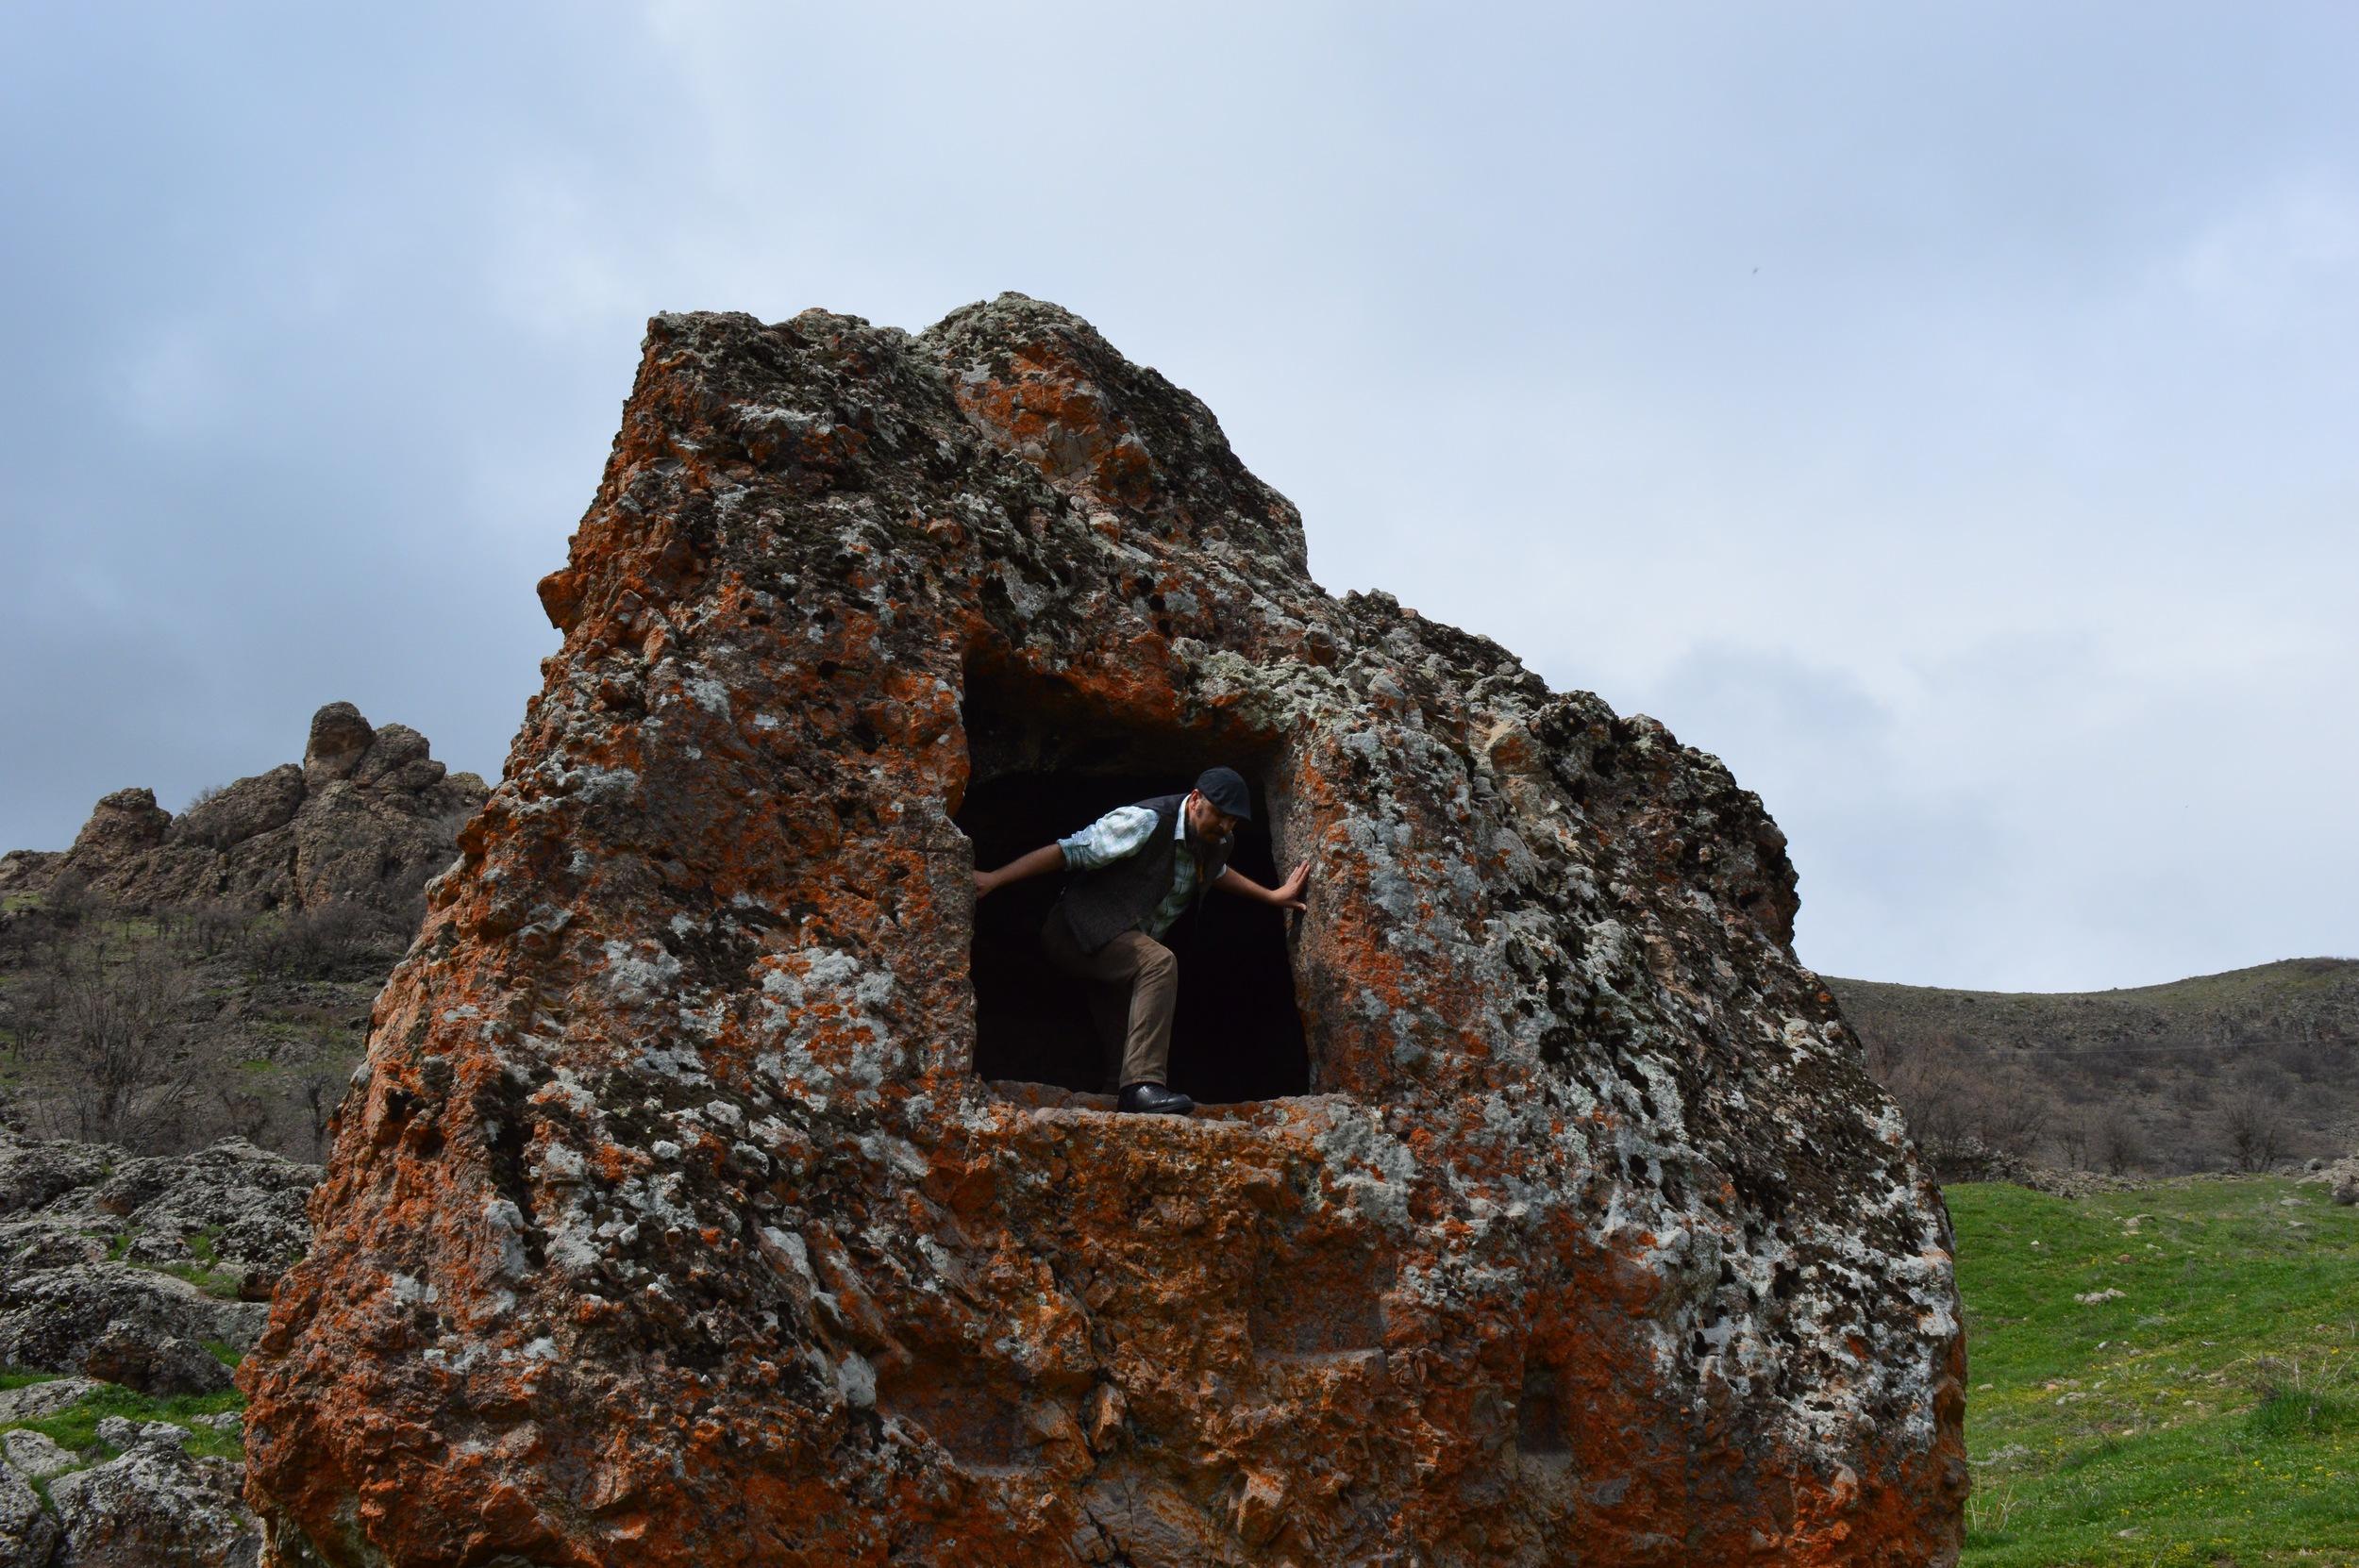 Serkan climbing into the rock-temple.